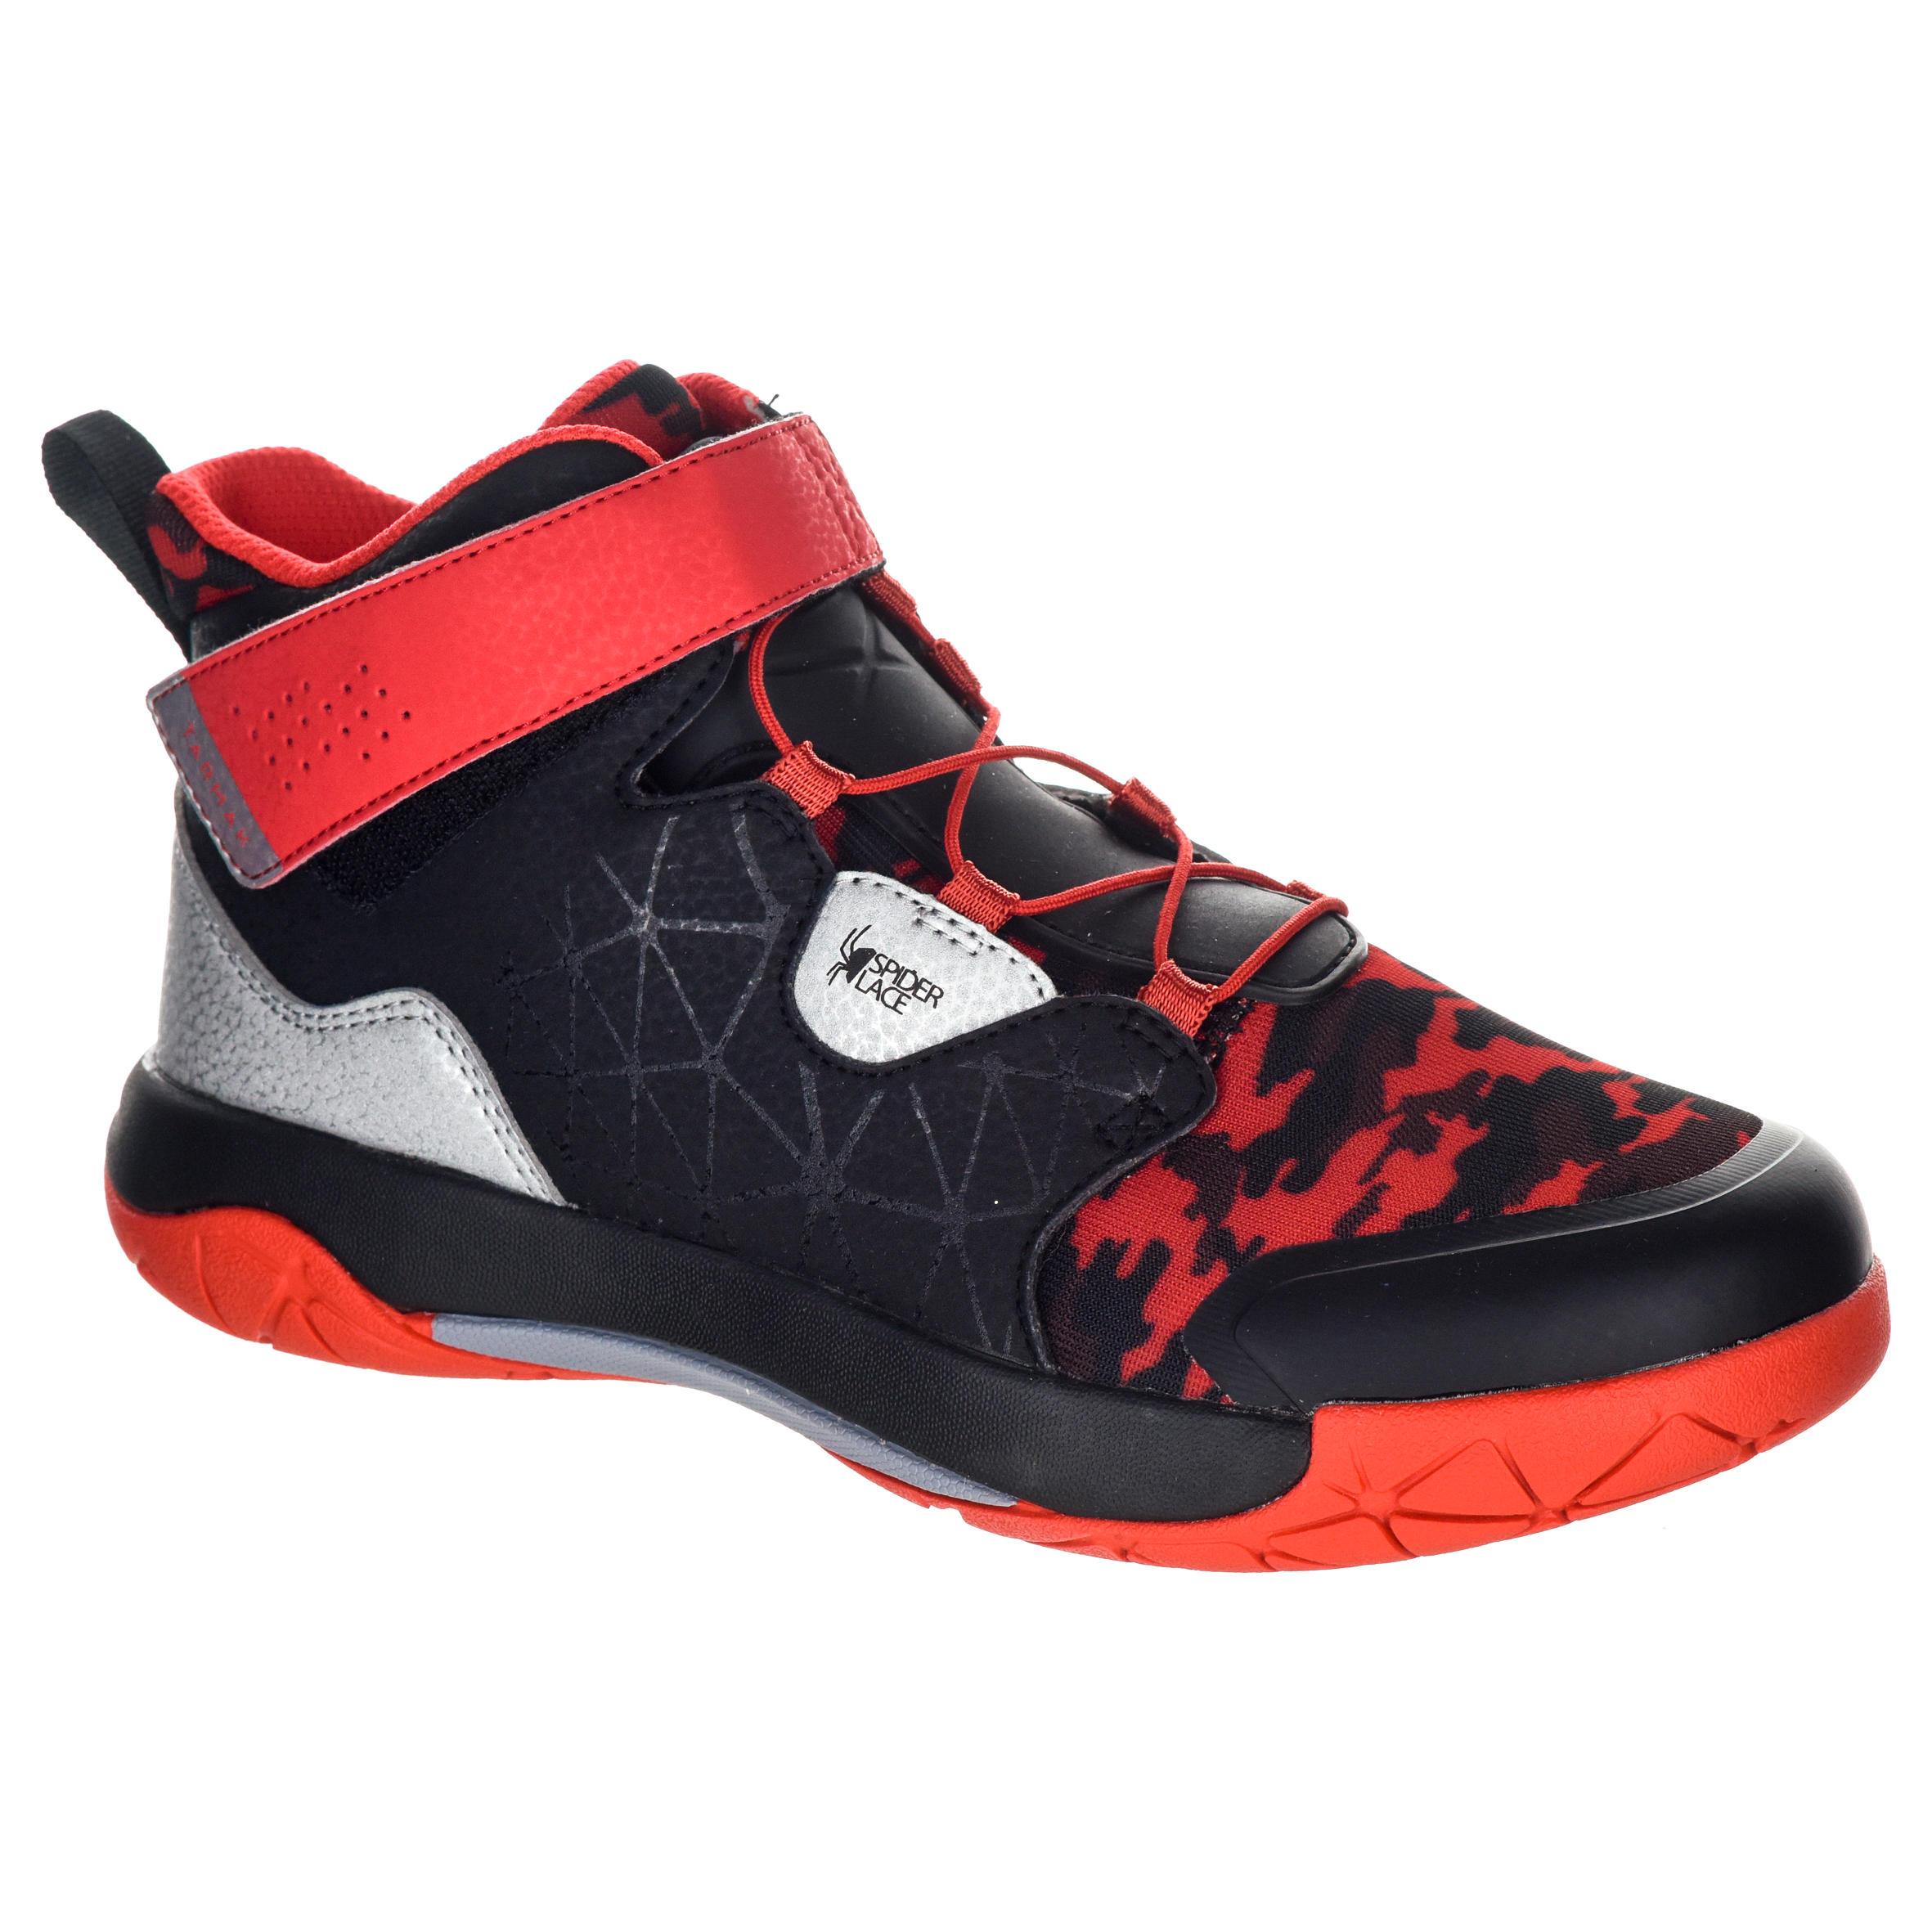 Tarmak Basketbalschoenen Spider Lace zwart/rood